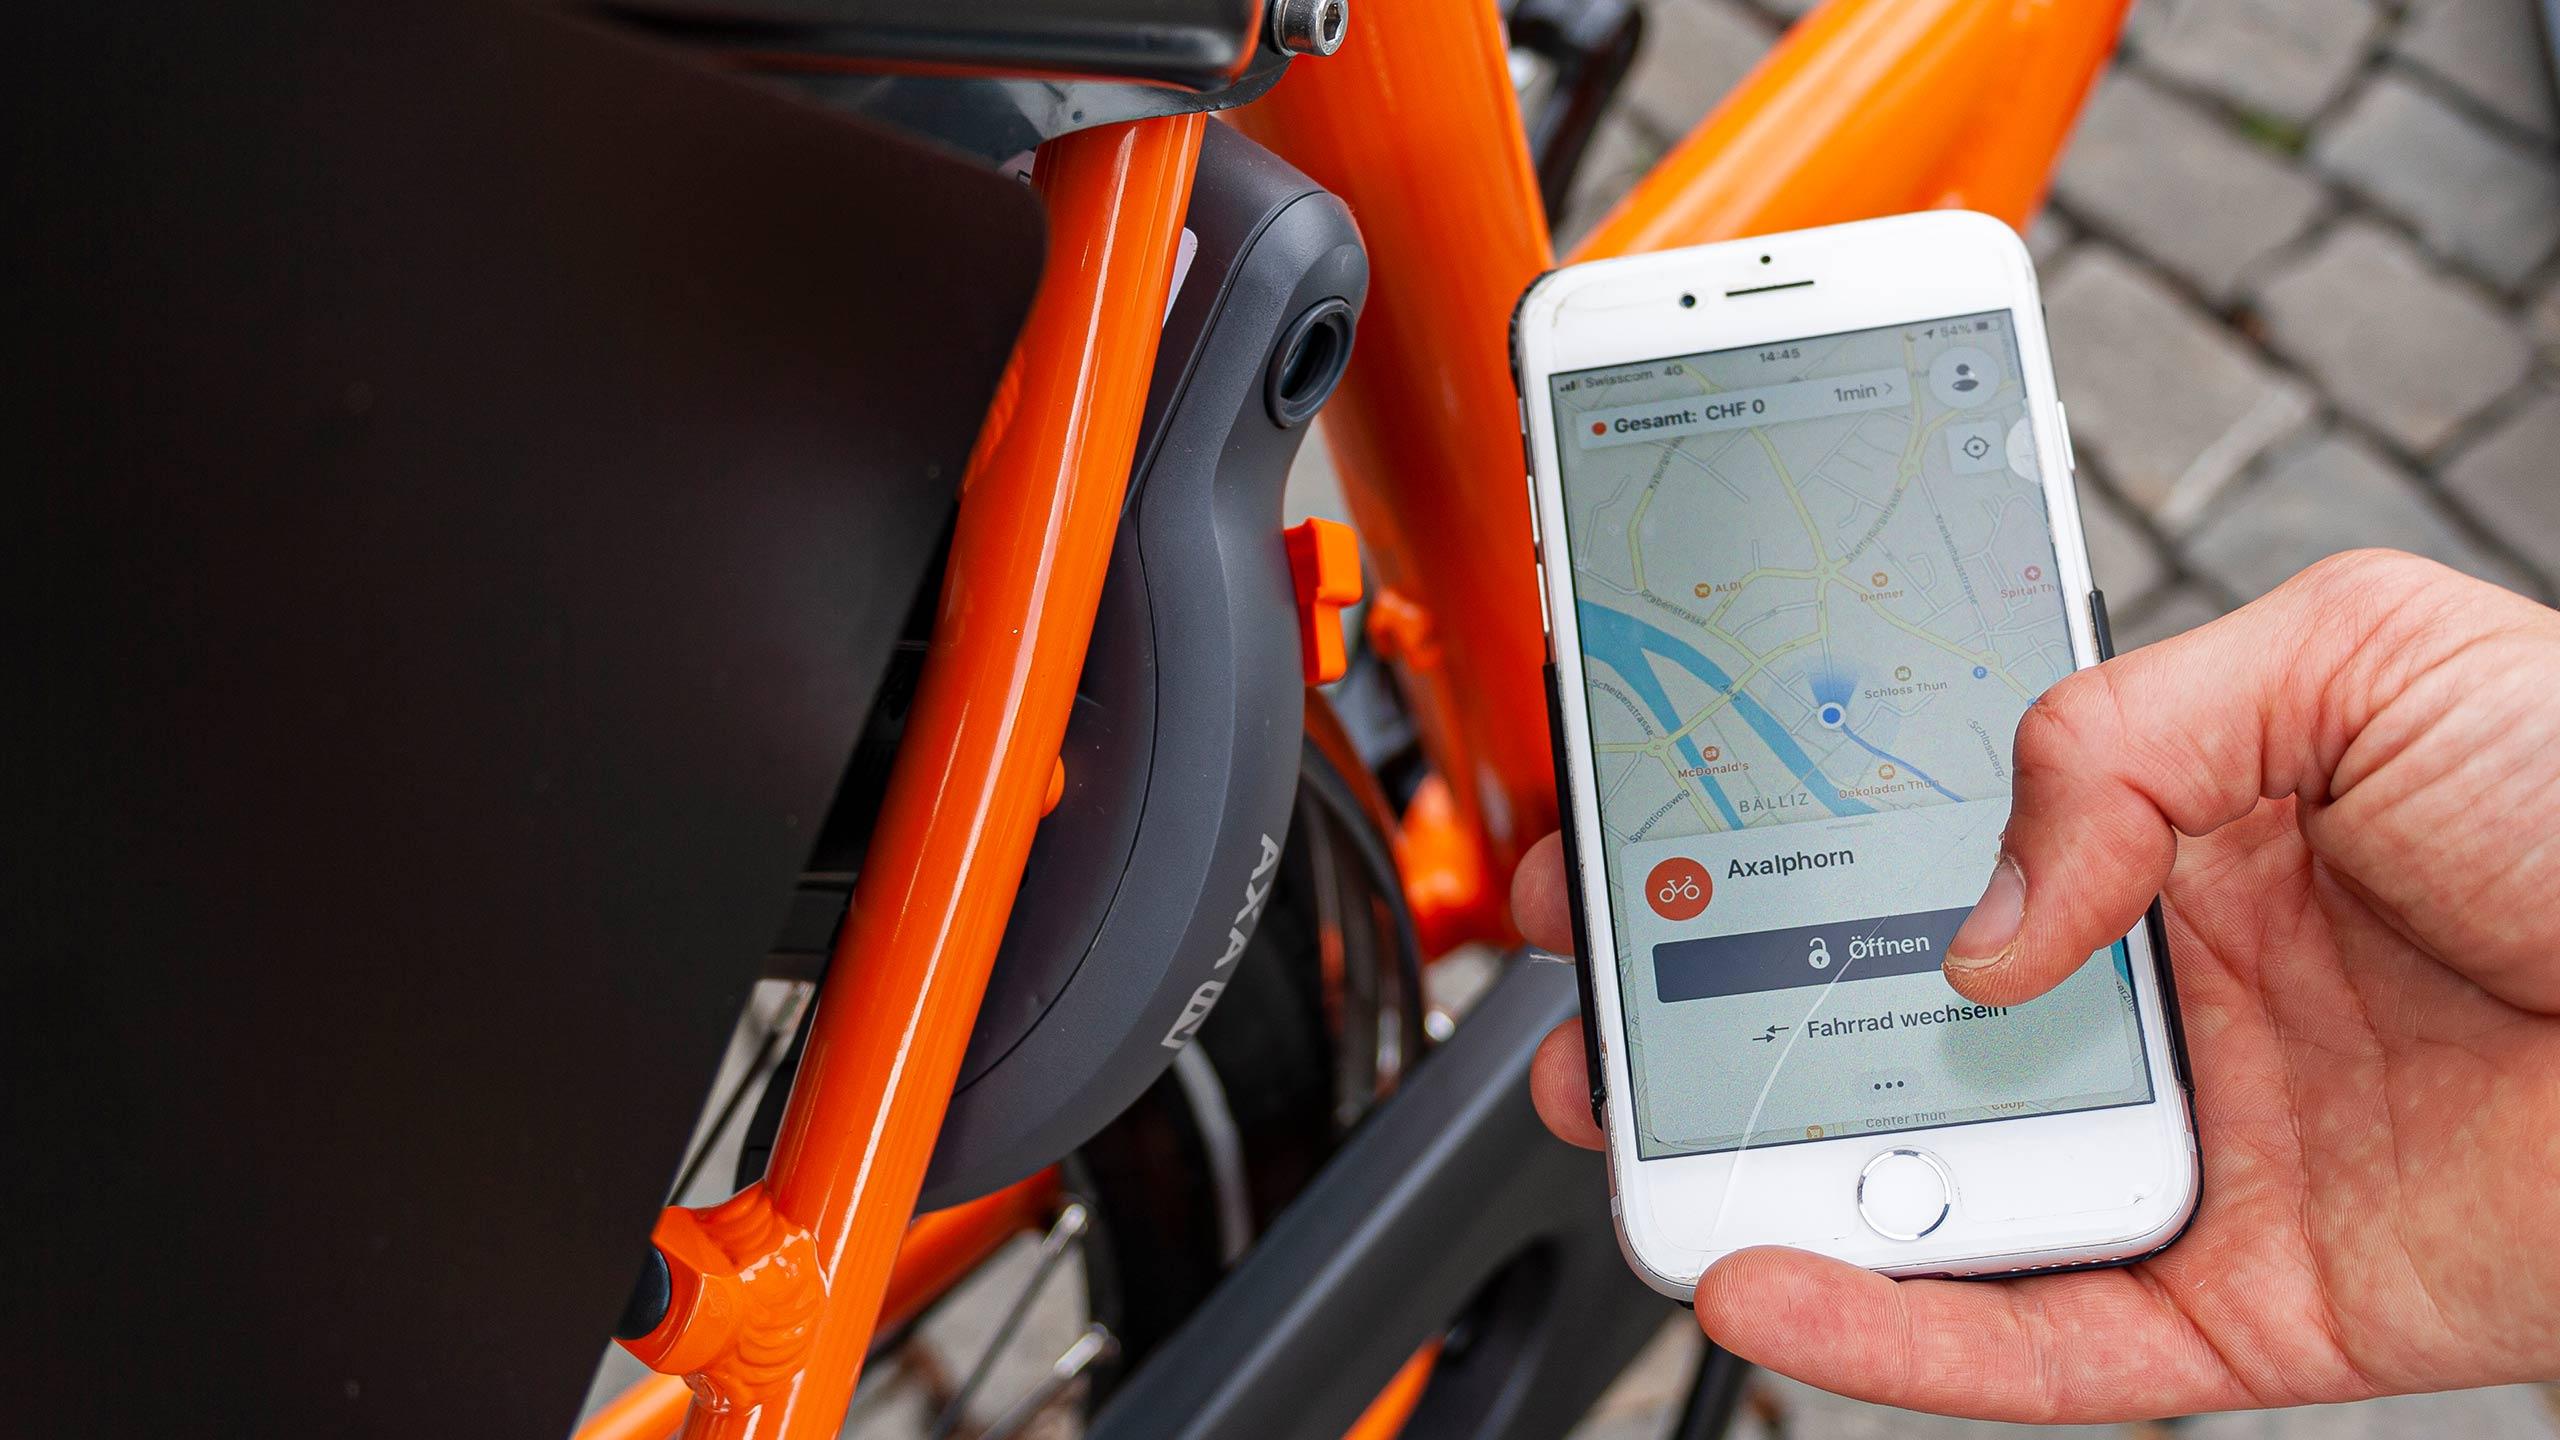 donkey-republic-thun-bike-entsperrvorgang-app.jpg